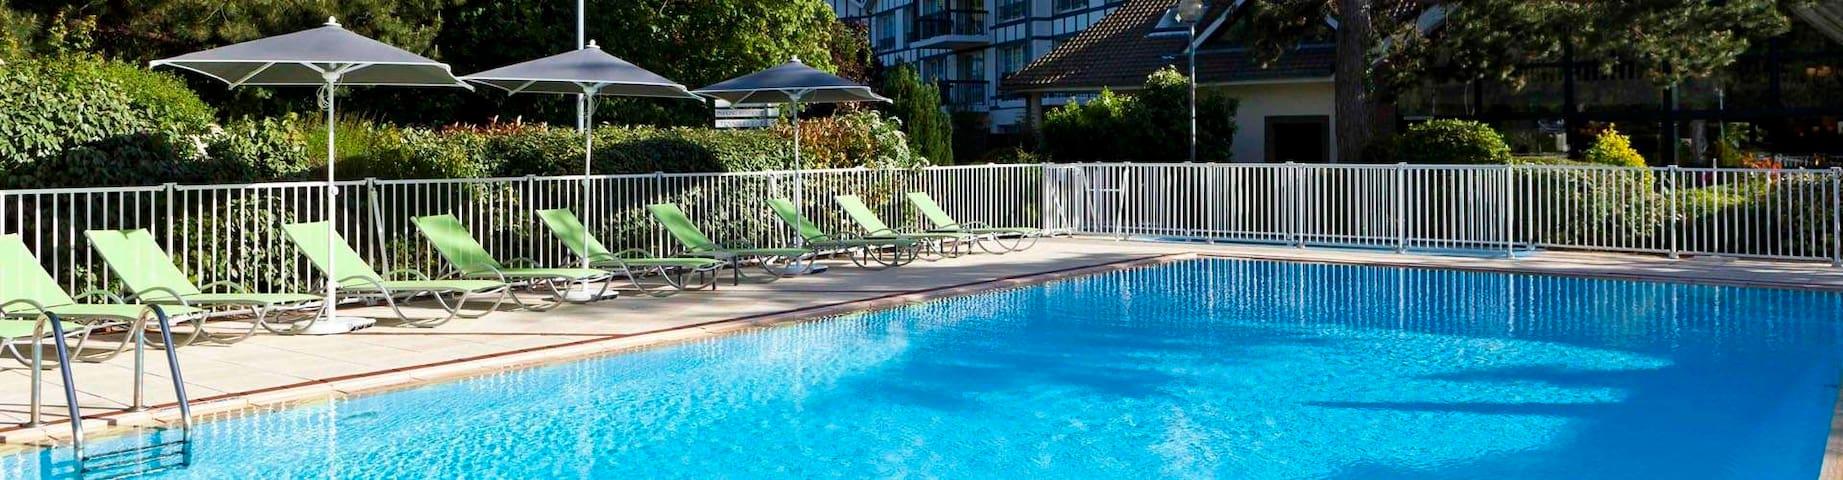 Appartement Duplex, parc avec tennis, piscine - Neufchâtel-Hardelot - Departamento